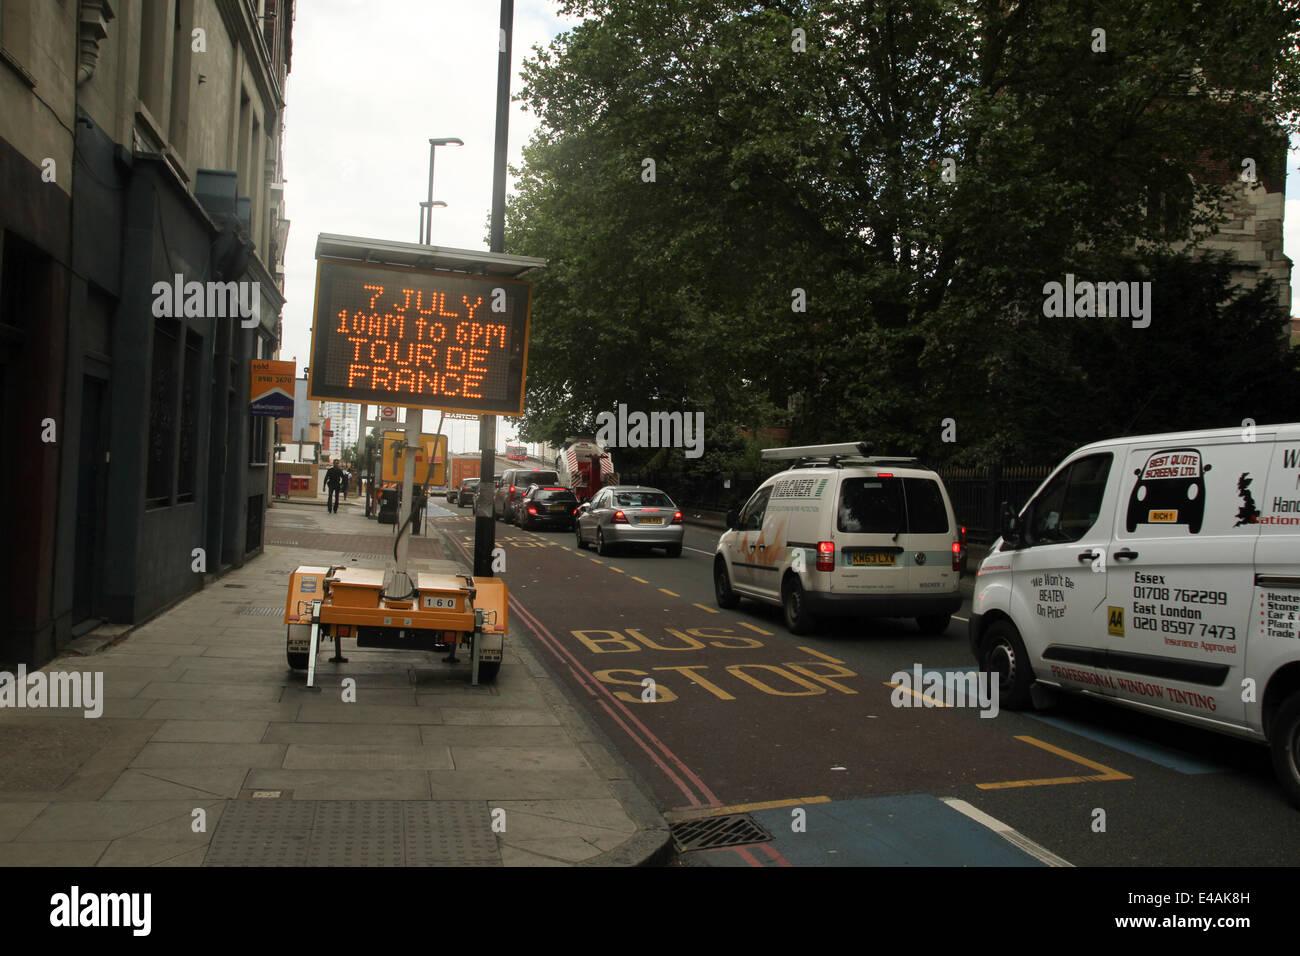 London, UK. 07th July, 2014. Rides make their way through Stratford High Street and onto West Ham Lane on Stage - Stock Image